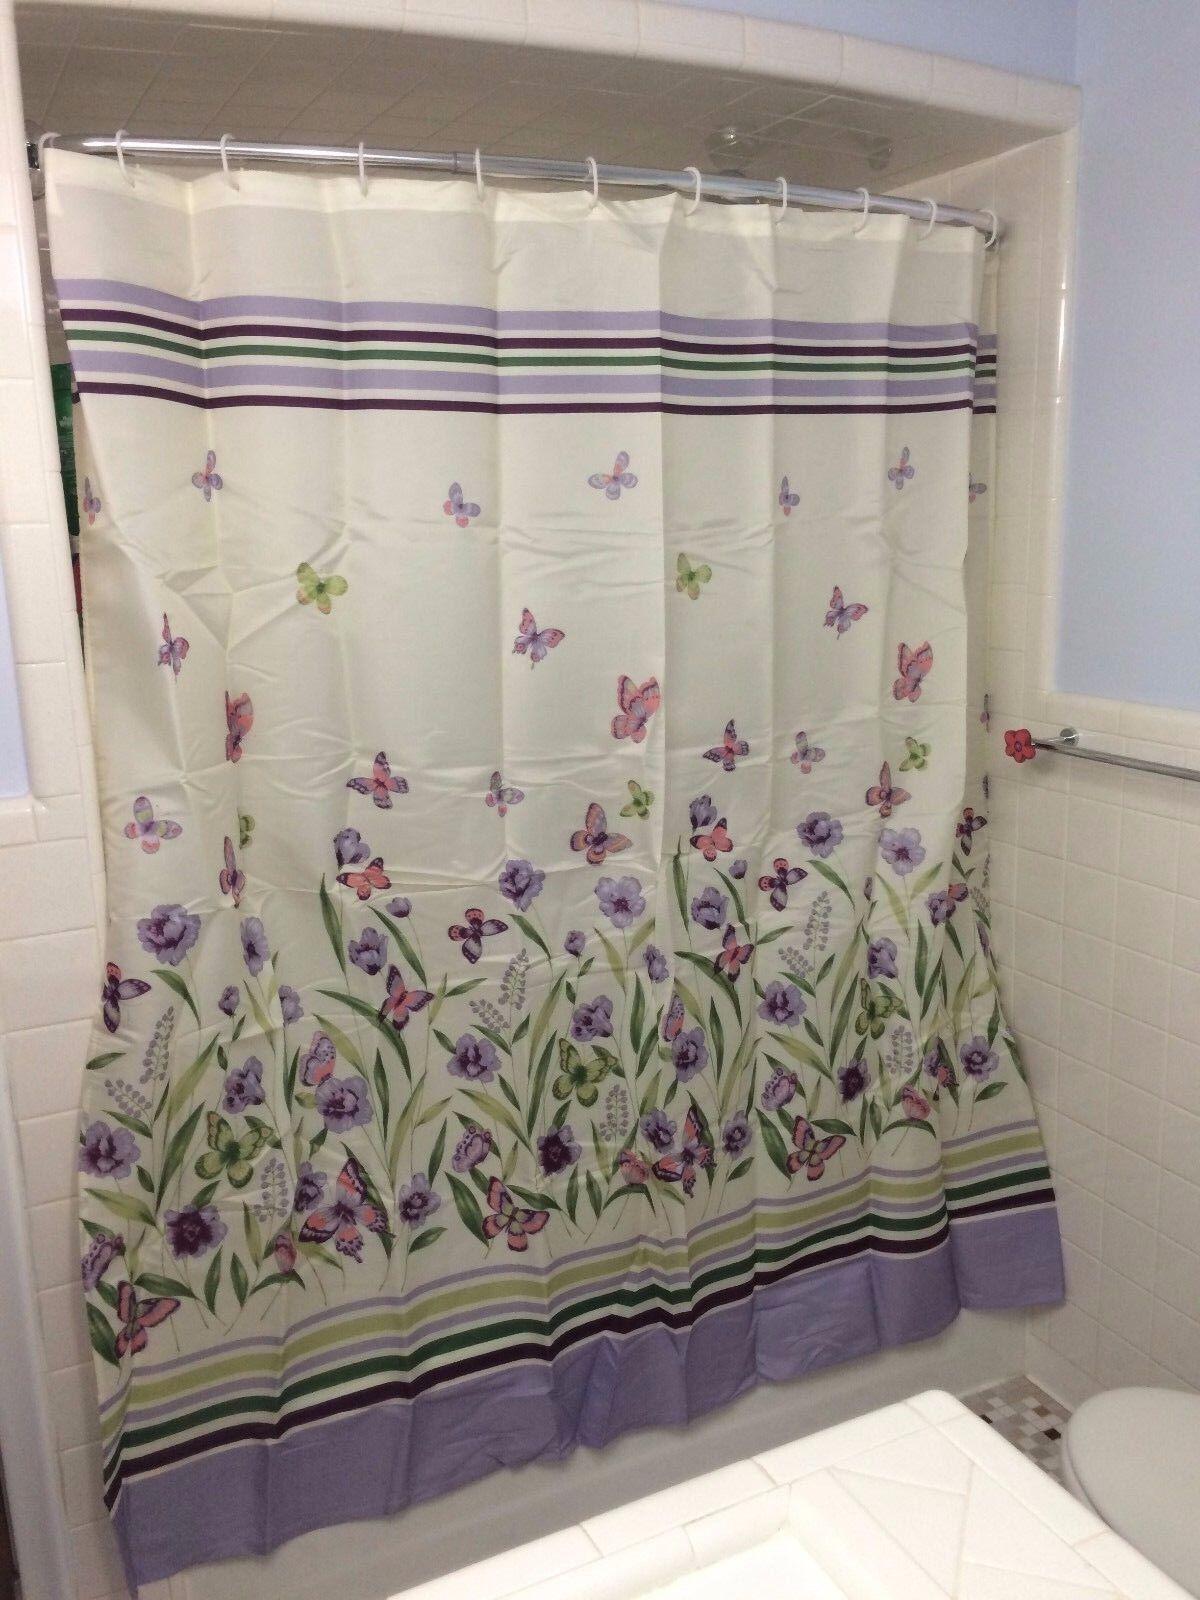 Botanical Butterfly Garden Lila Grun Floral Shower Curtain Bathroom Decor D41887